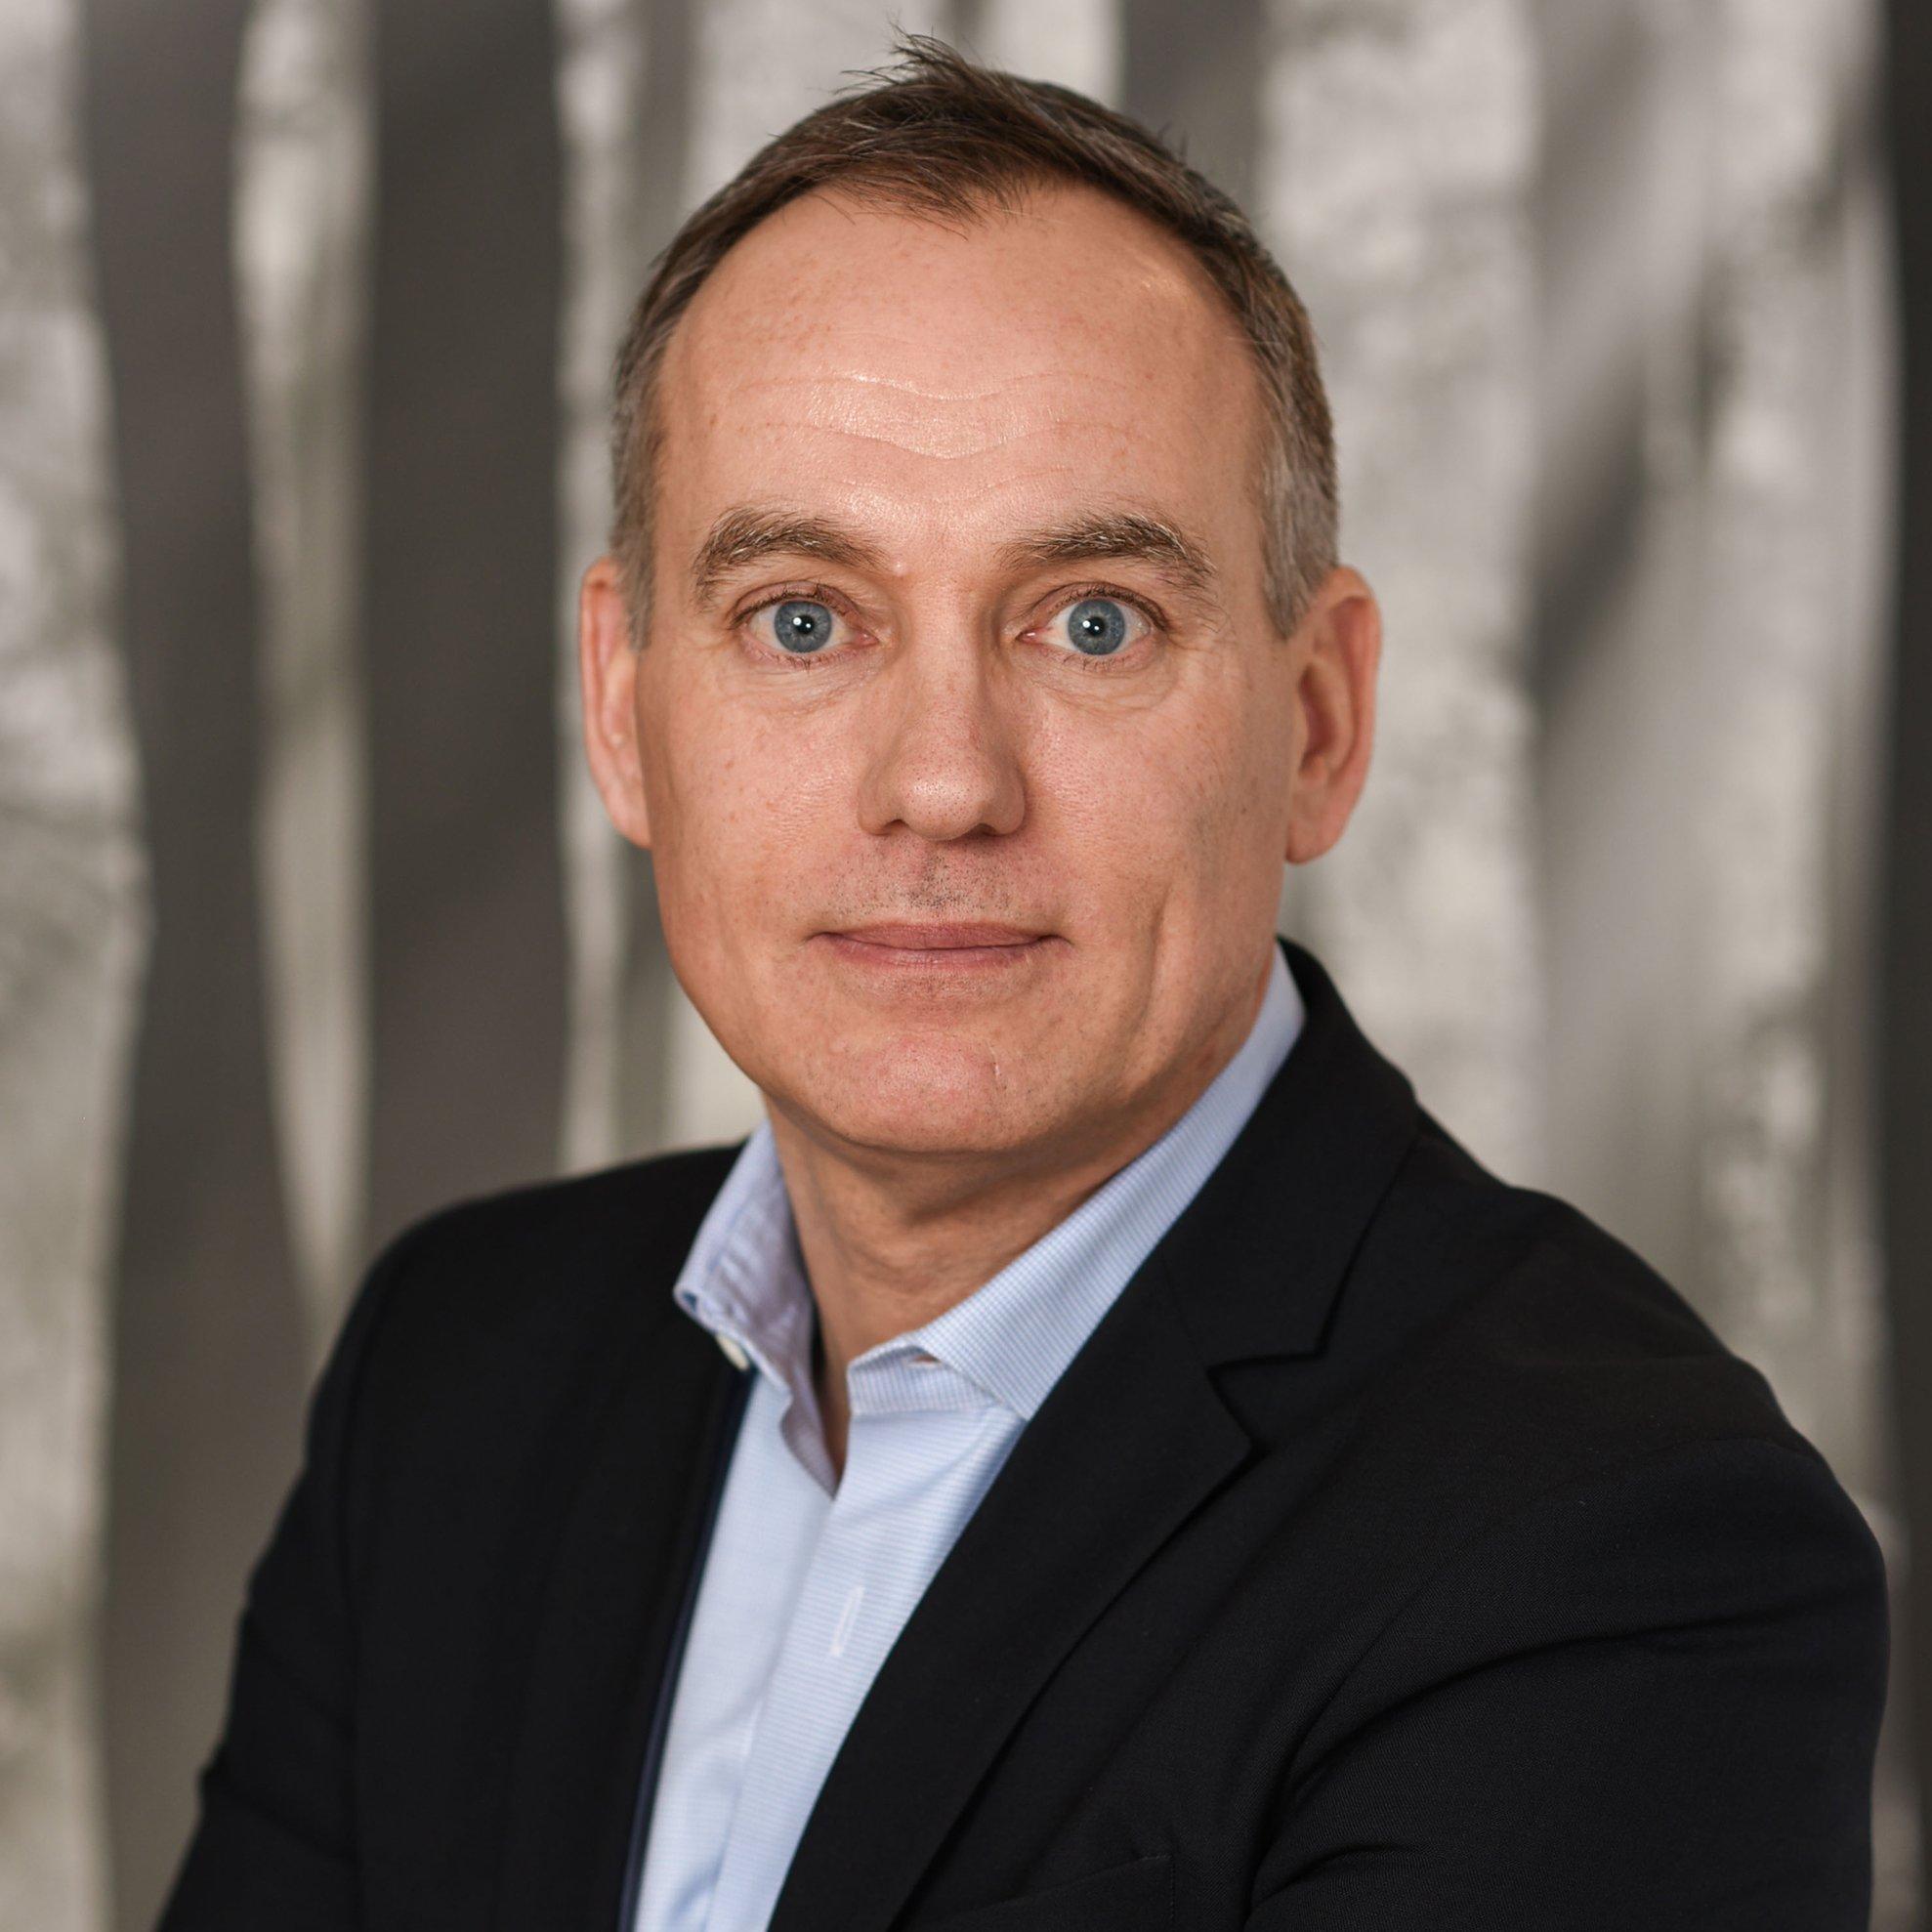 Jonas Hasselberg